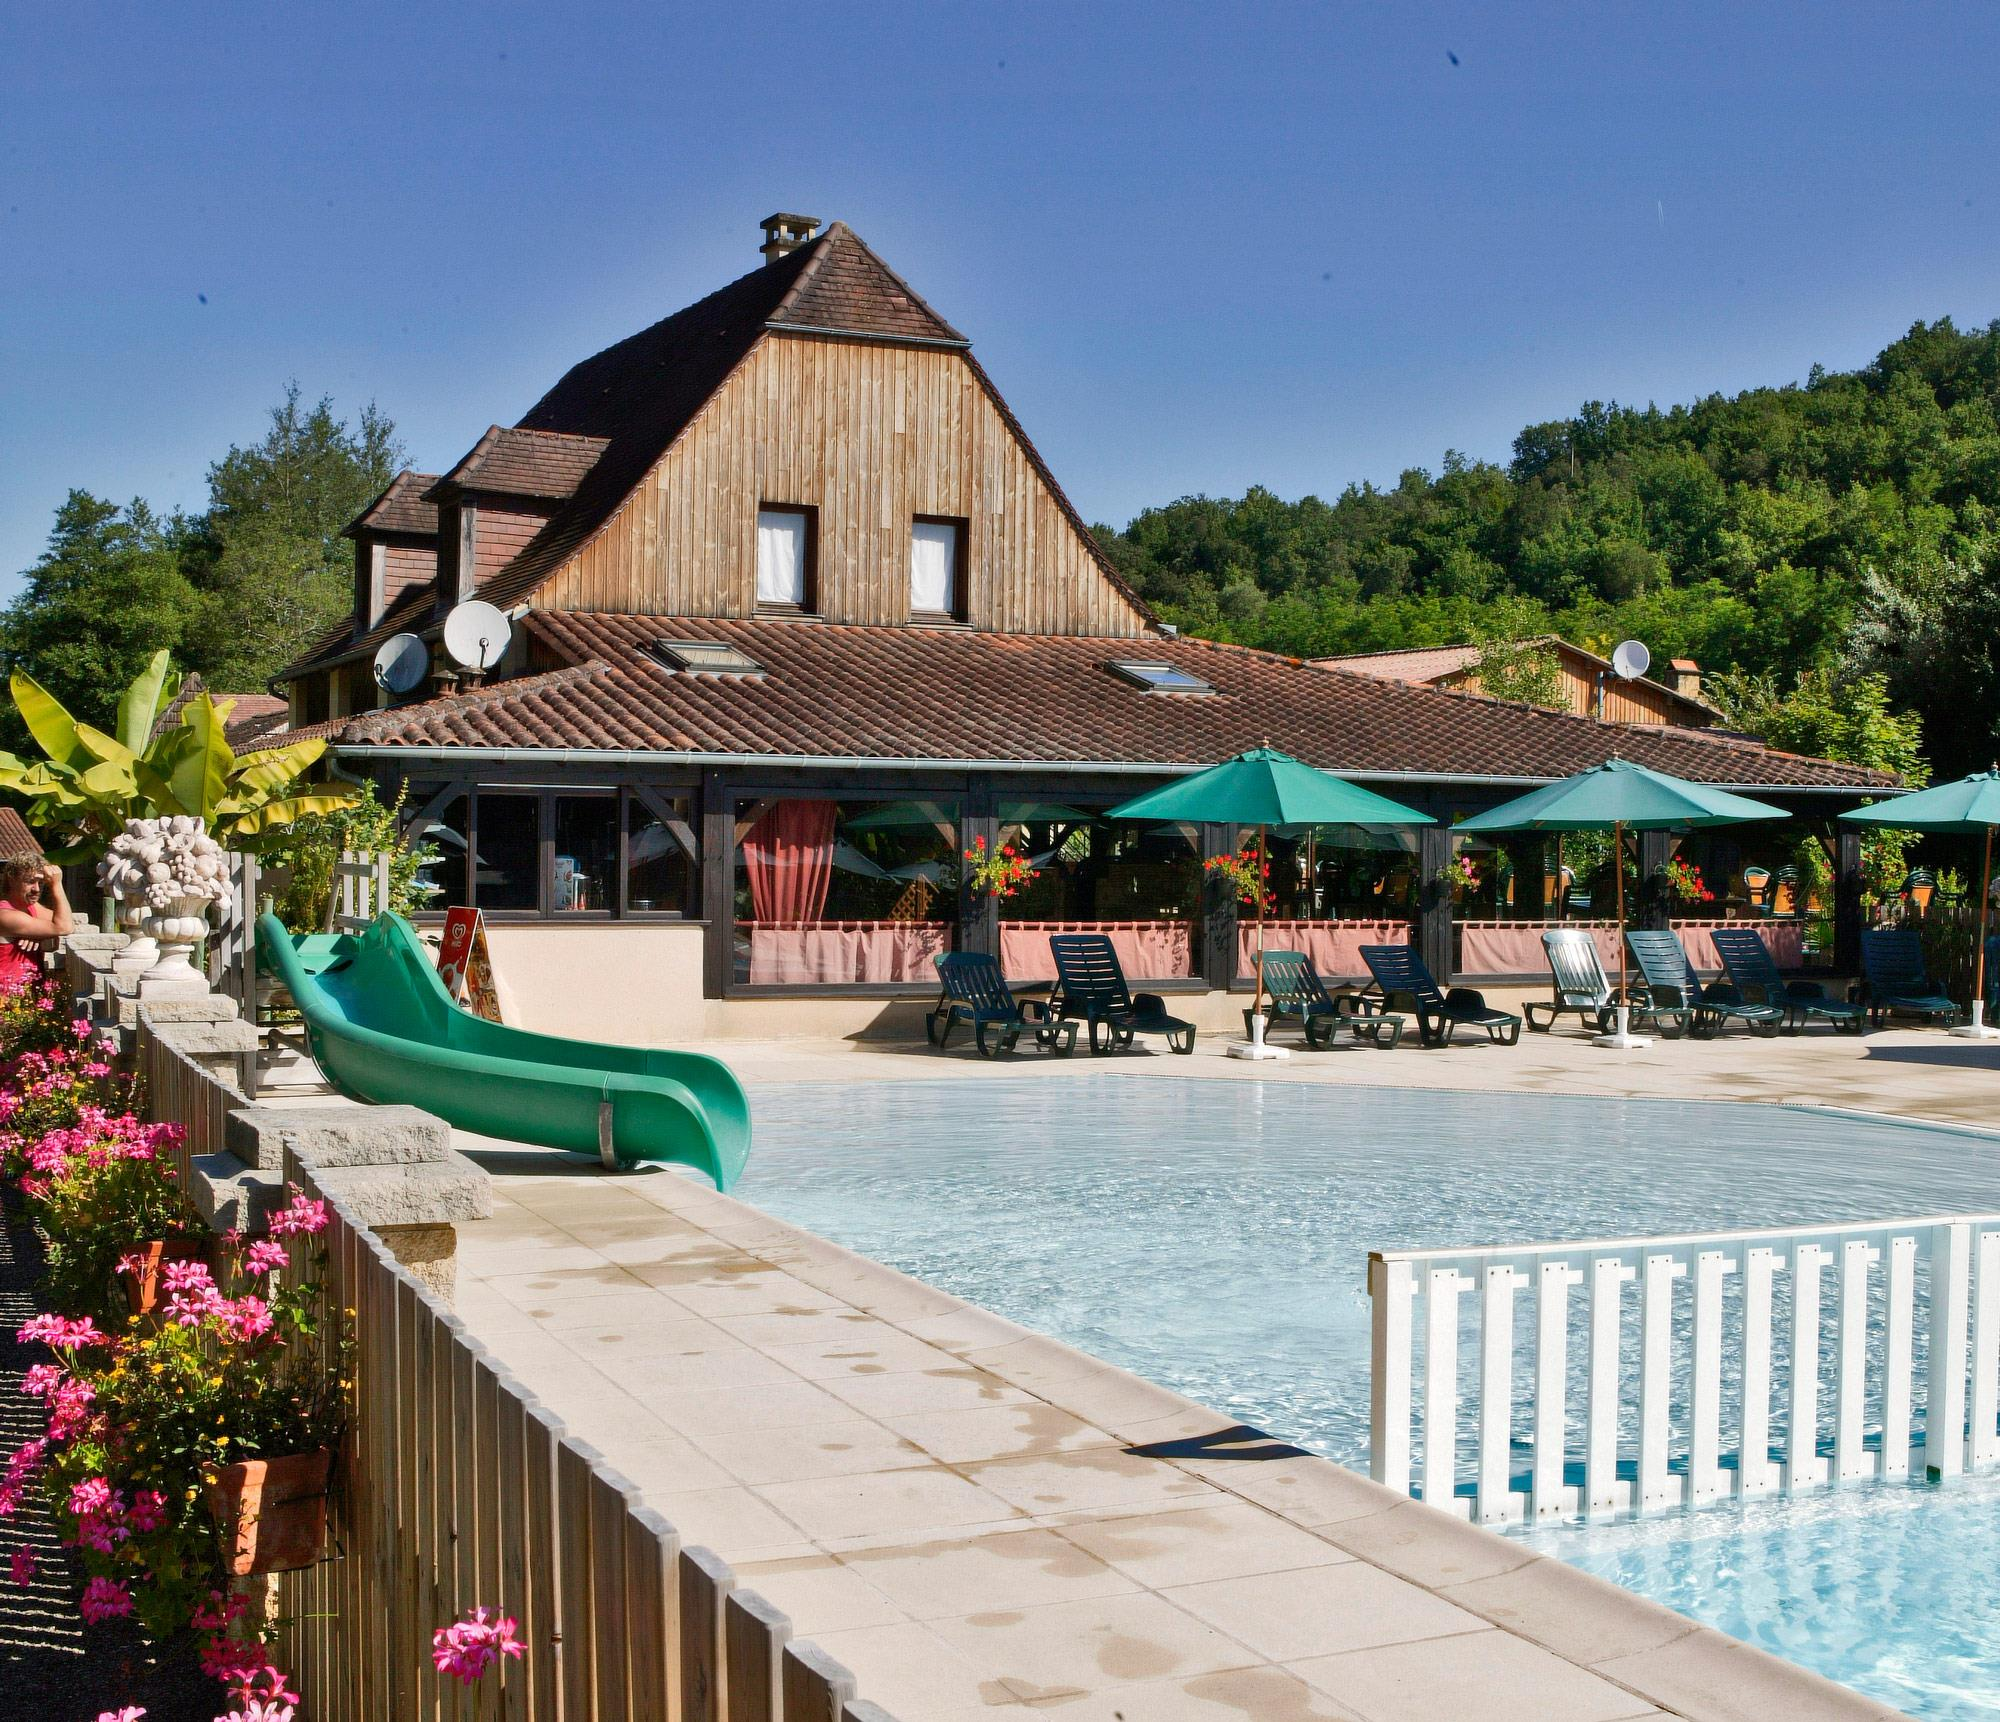 Camping le Moulin du Roch, Sarlat, Dordogne